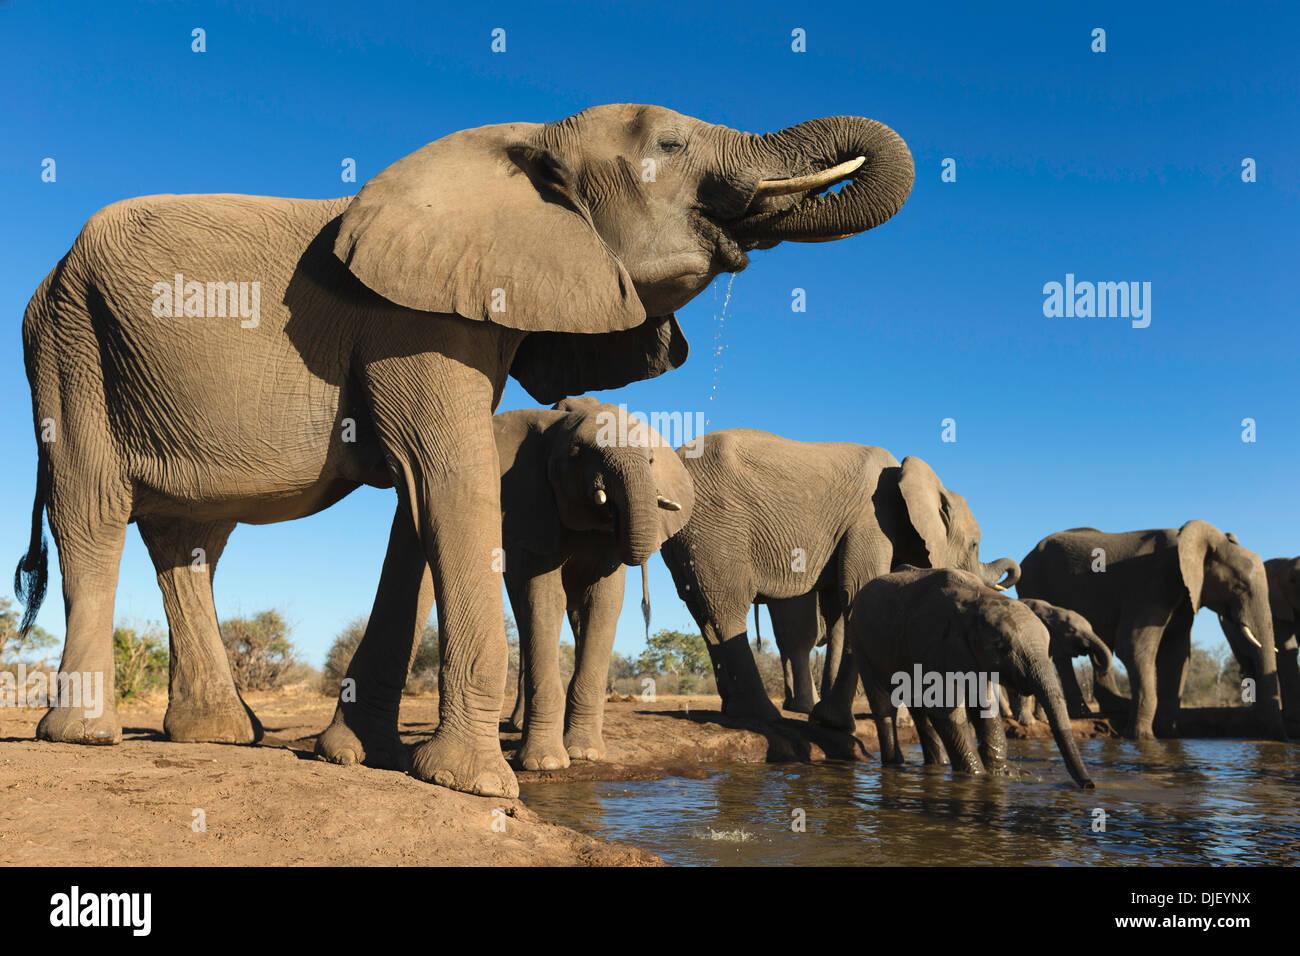 African elephant (Loxodonta africana) small group of elephants drinking at a waterhole in Mashatu game reserve.Botswana - Stock Image